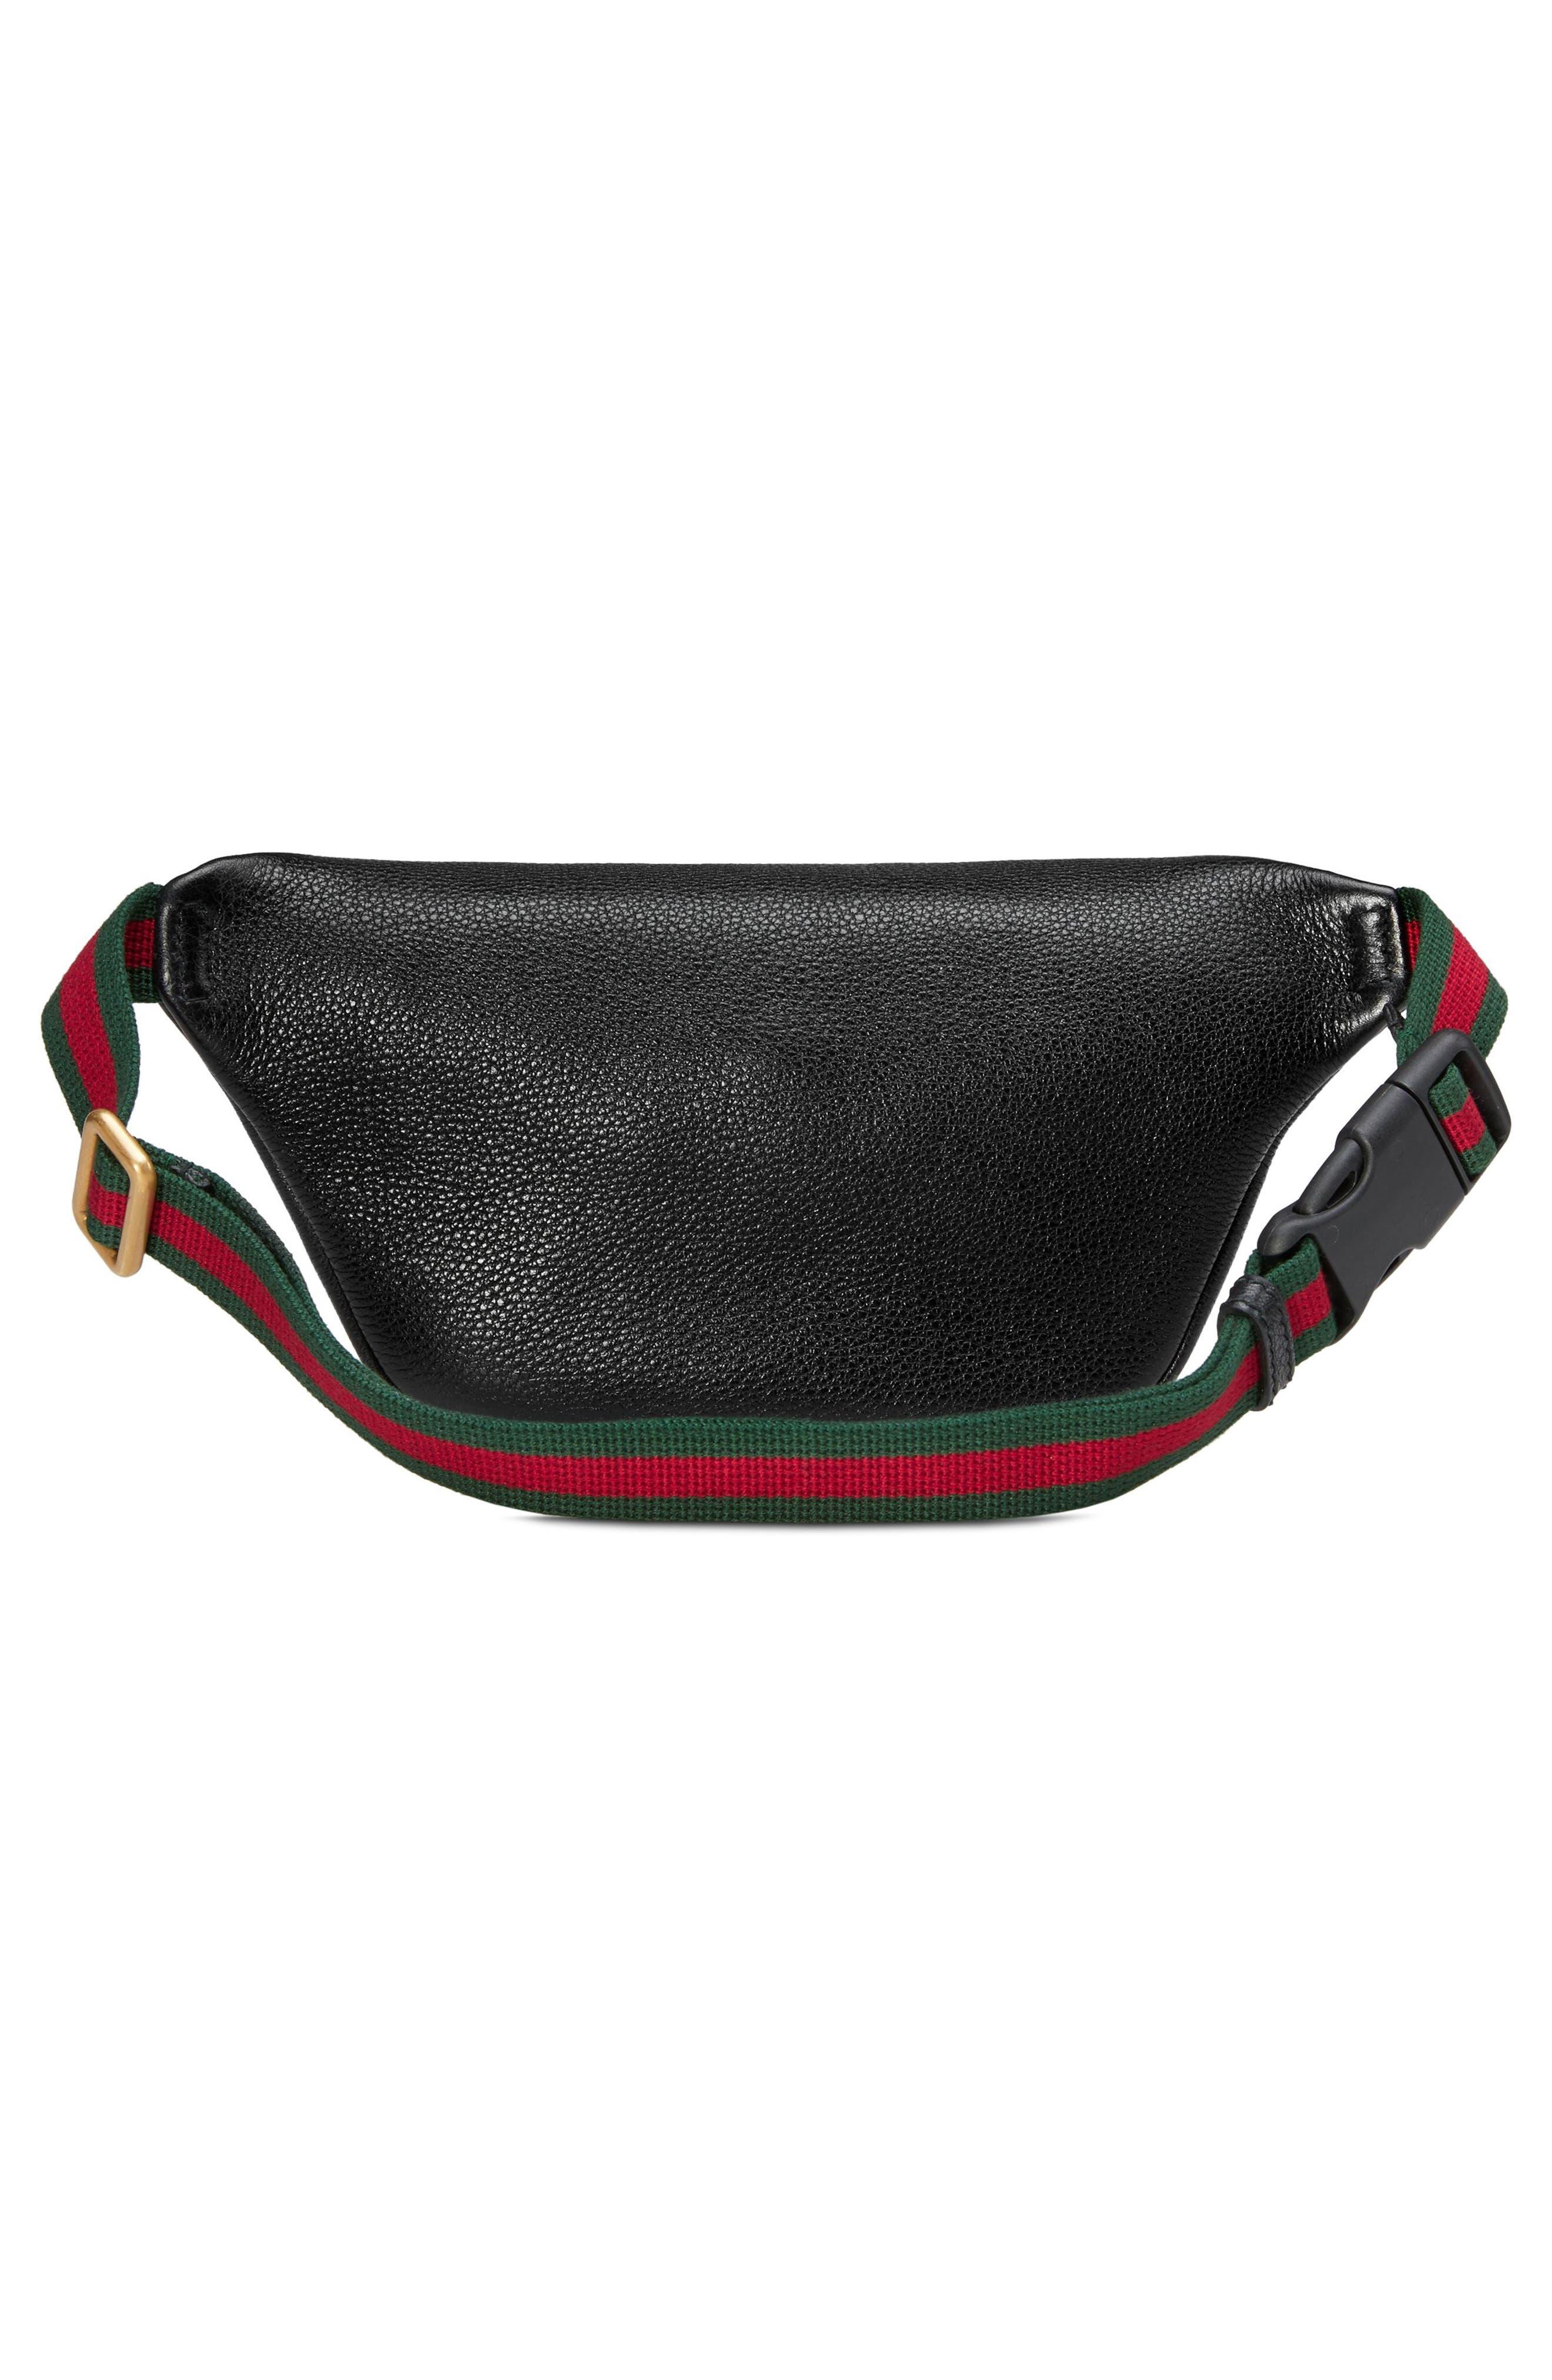 361aa19f25f8 Gucci Belt Bags & Fanny Packs   Nordstrom